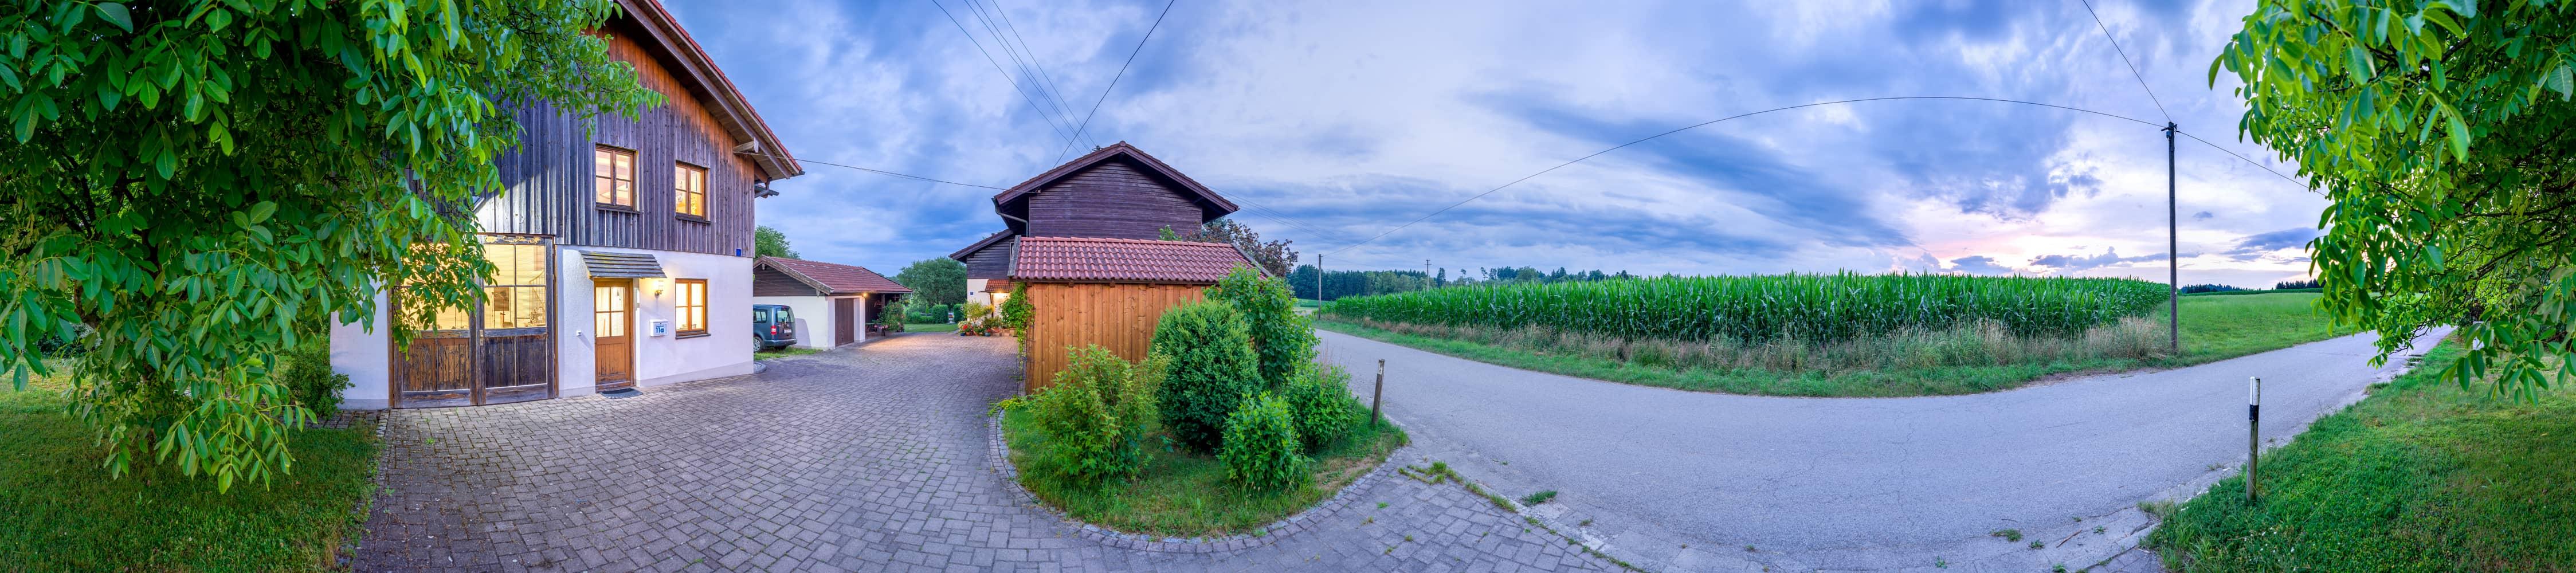 Panoramaaufnahme Studio Landschaft